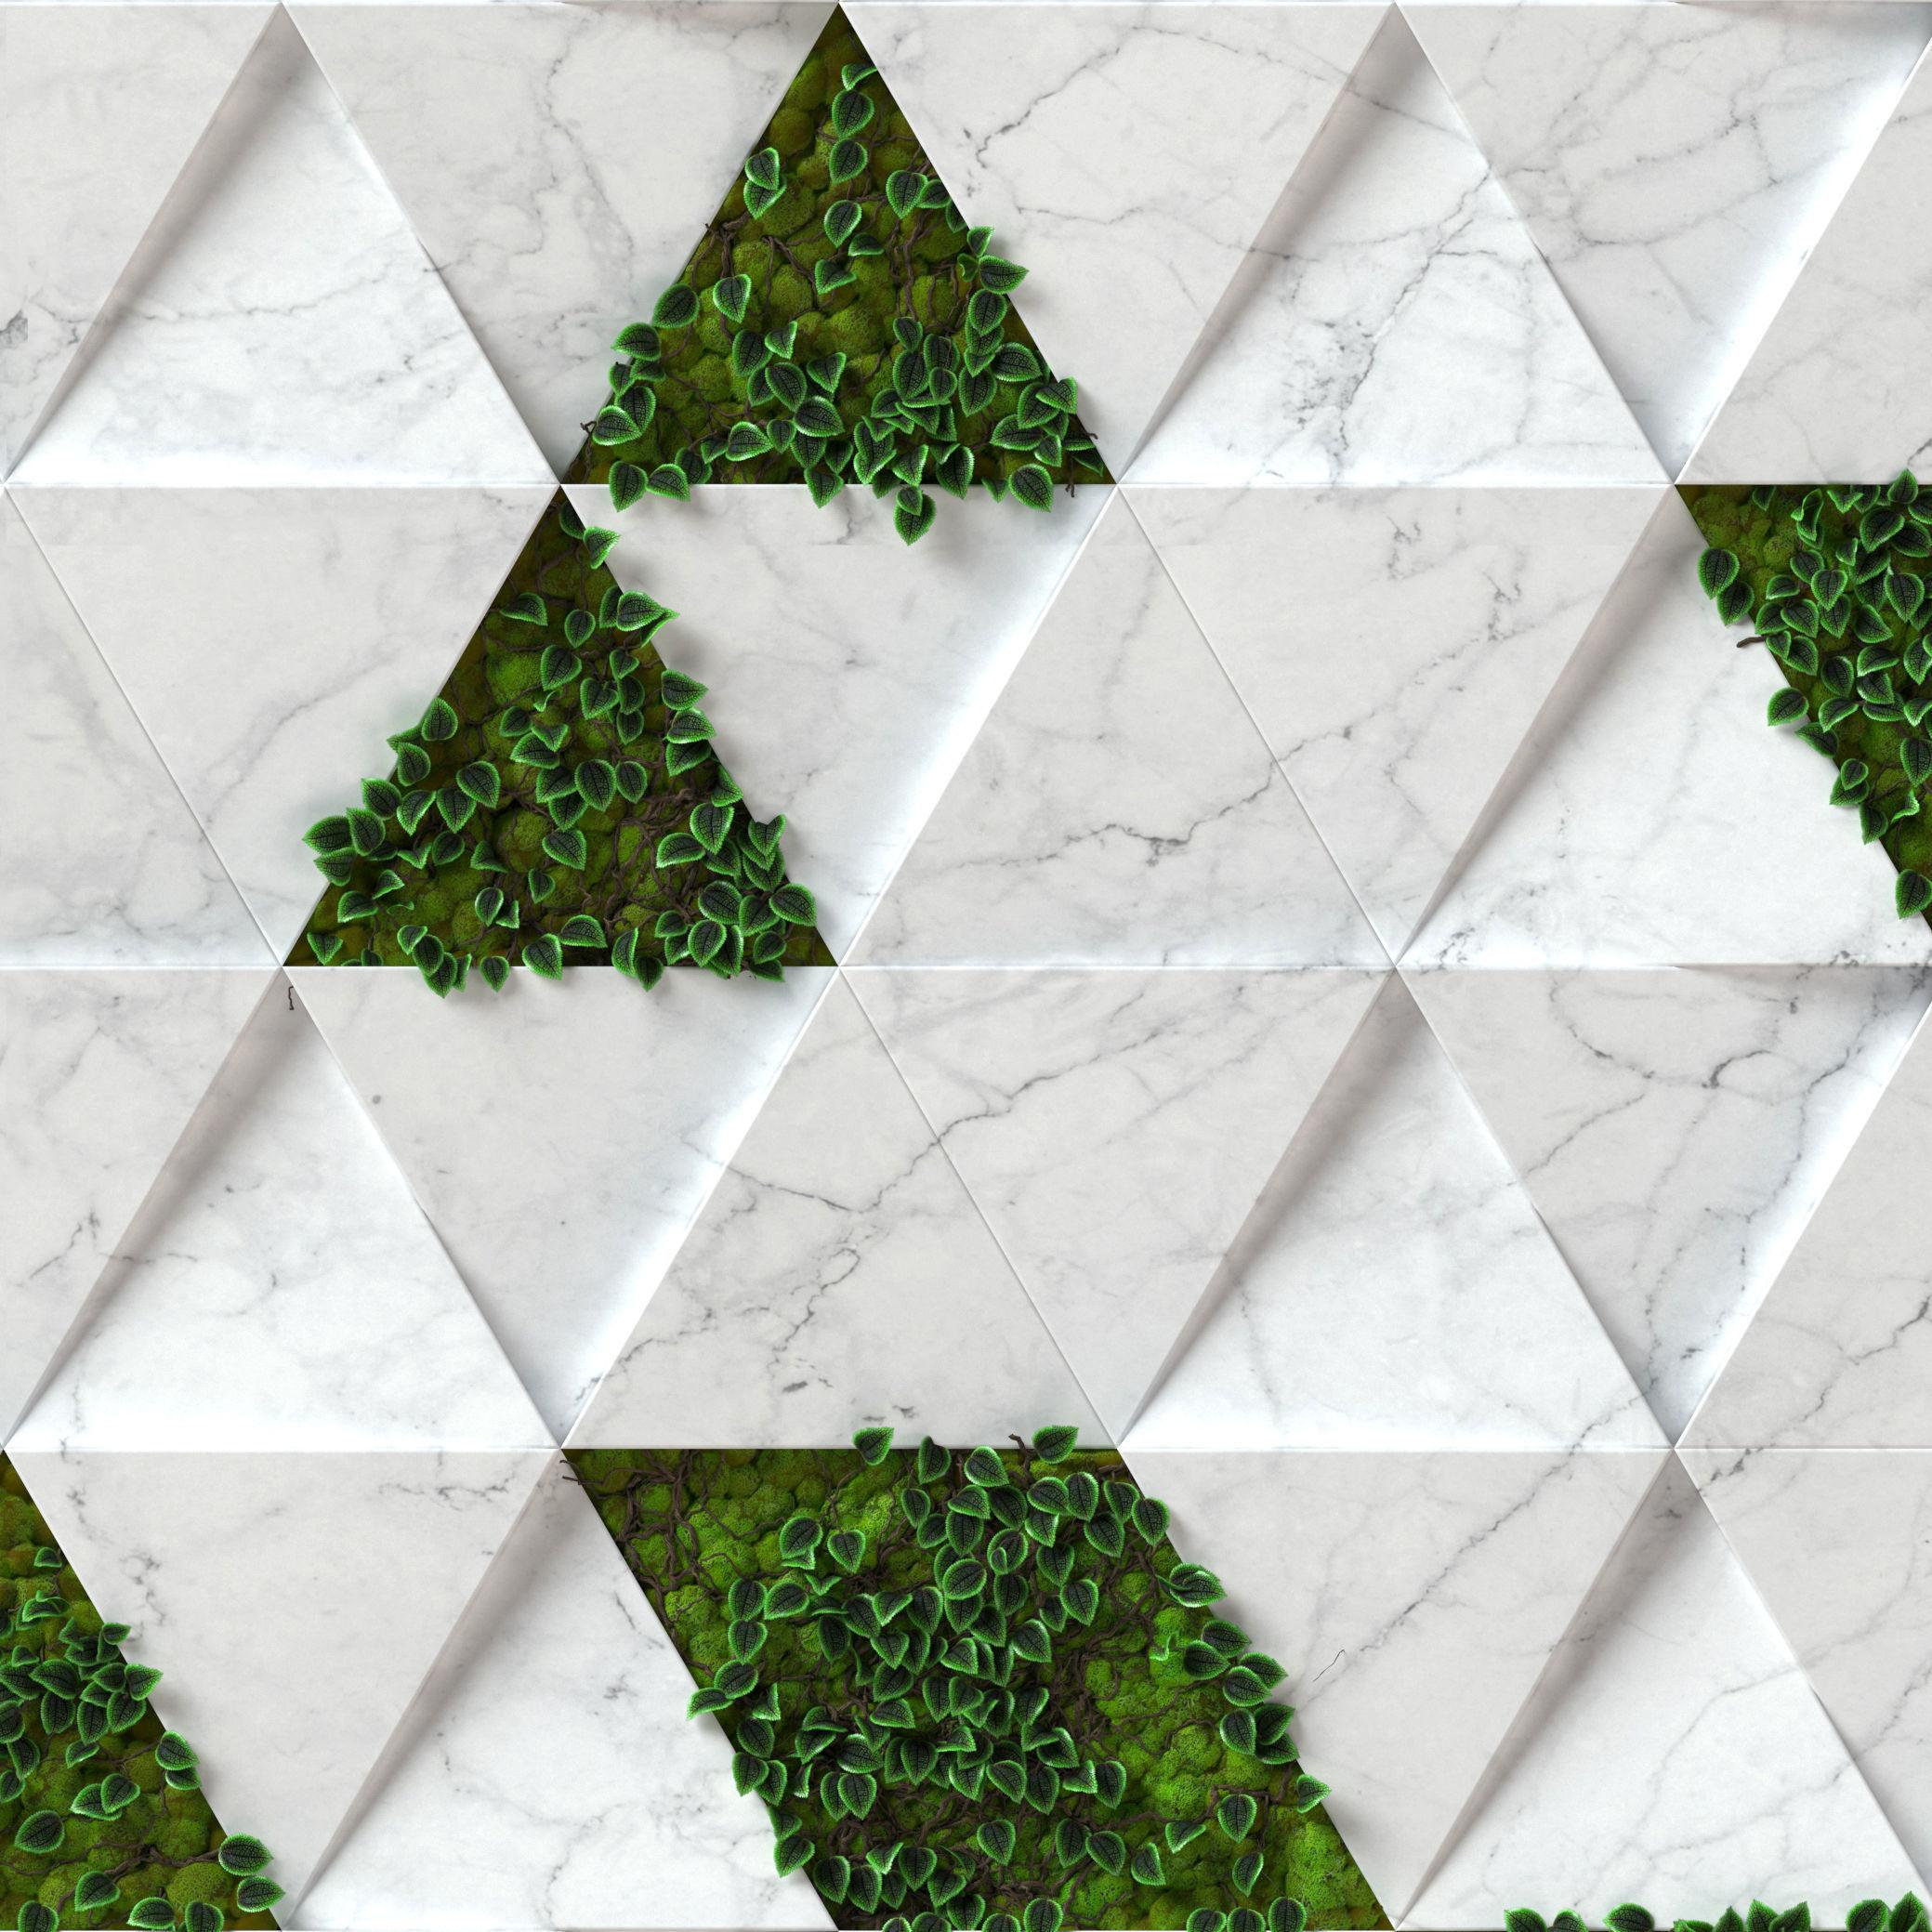 Stone Moss - Seamless Wall Panel Texture 3D